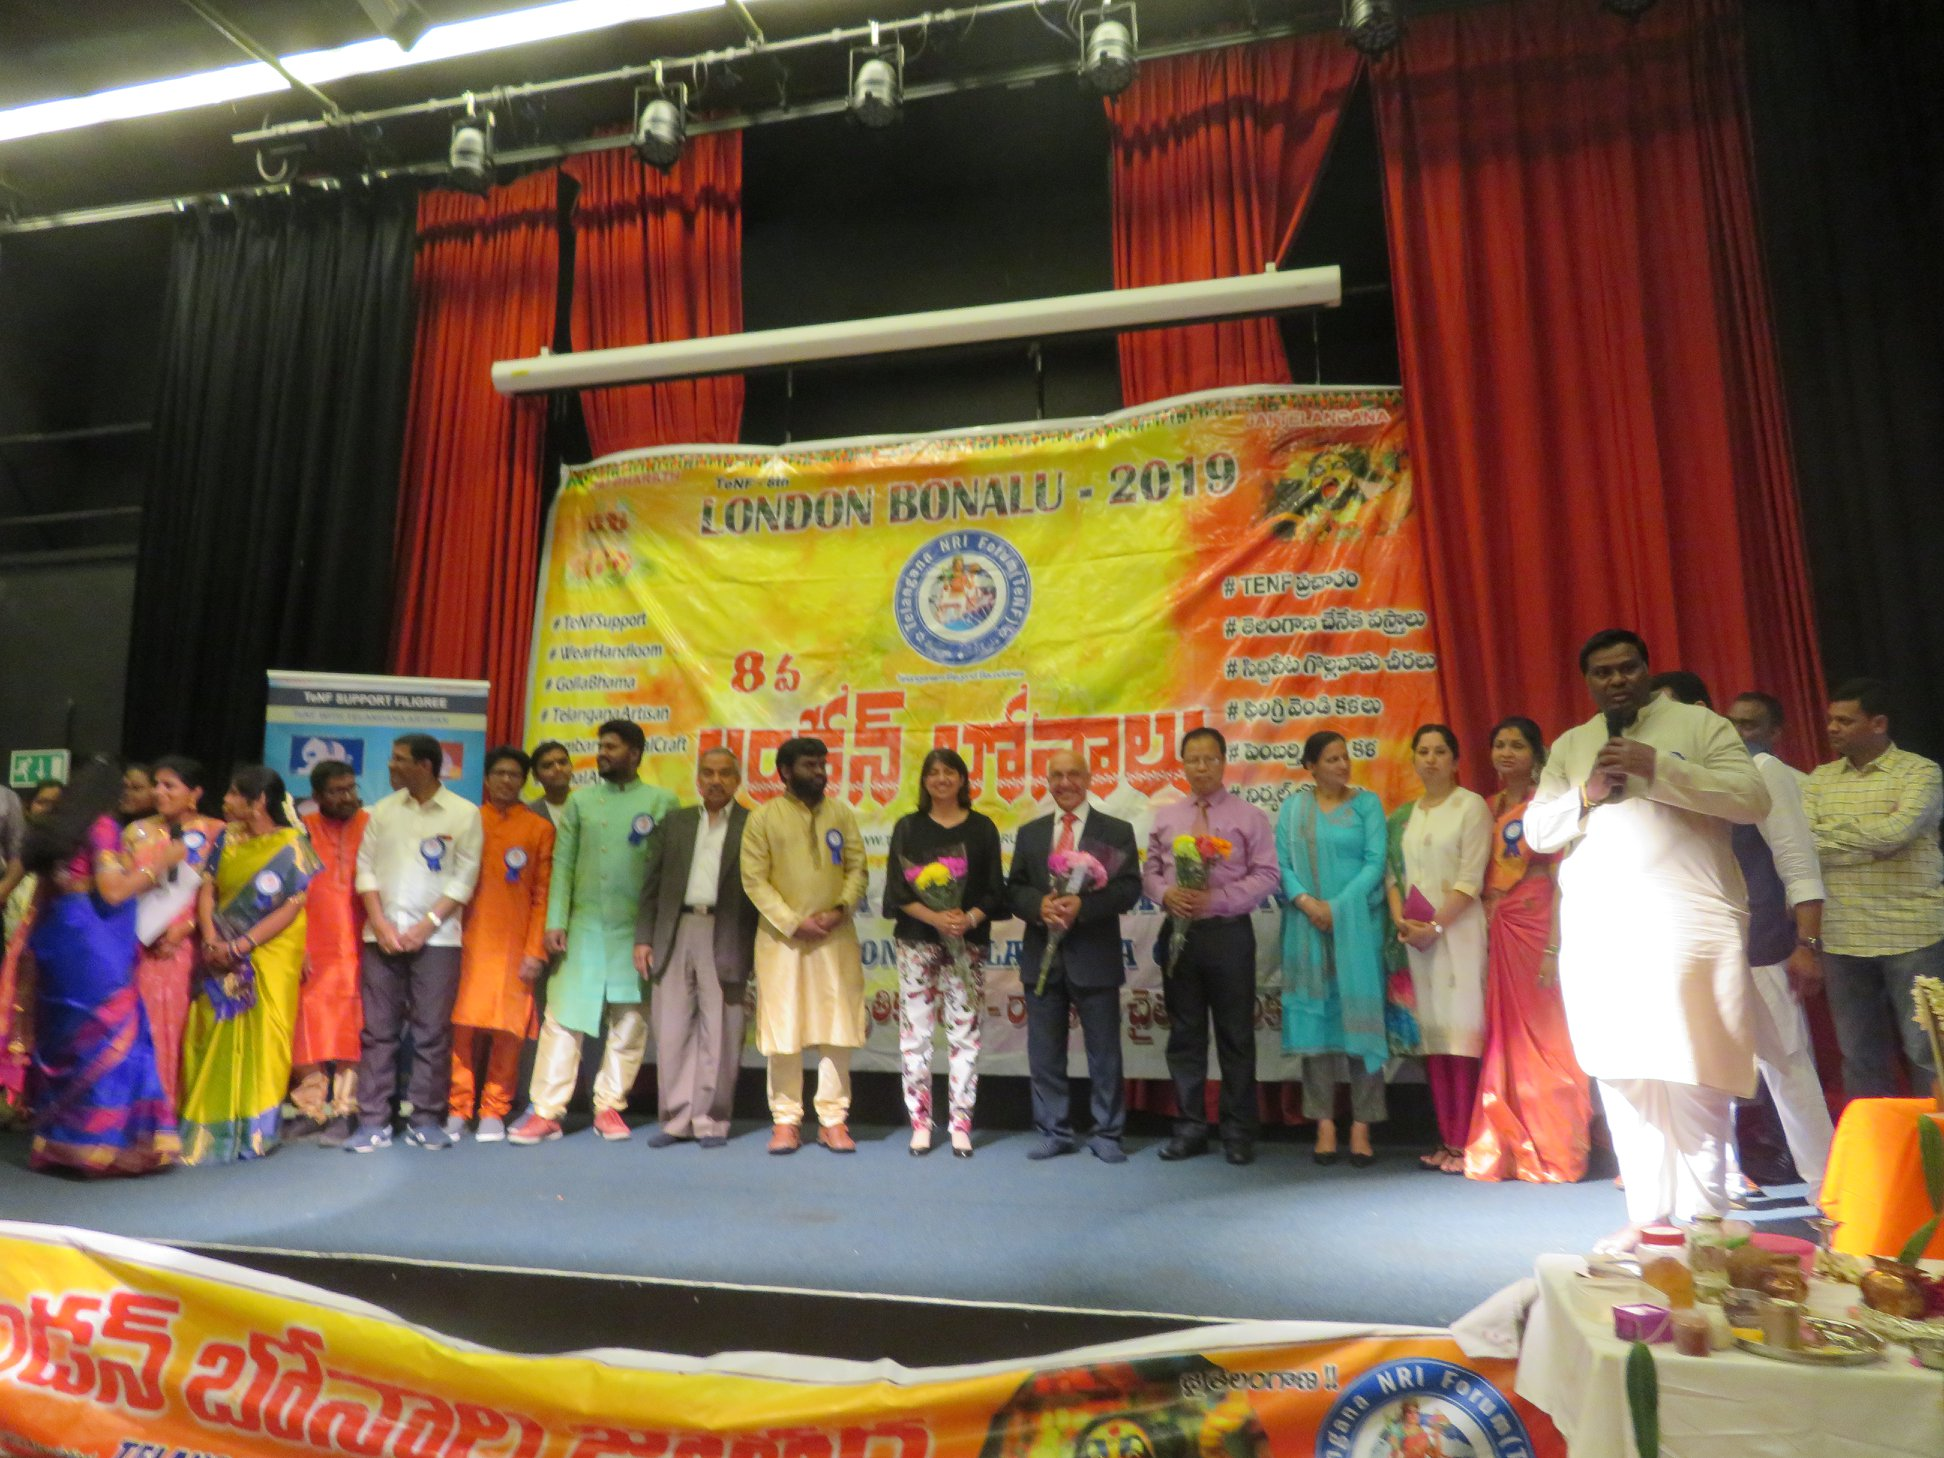 Indian origin local MPs Virendra Sharma, Seema Malhotra, Ruth Cadbury, Hounslow Deputy Mayor Raghwinder Siddhu and Indian High Commission to UK representative Prem Jeet were guests of honour on the occasion.